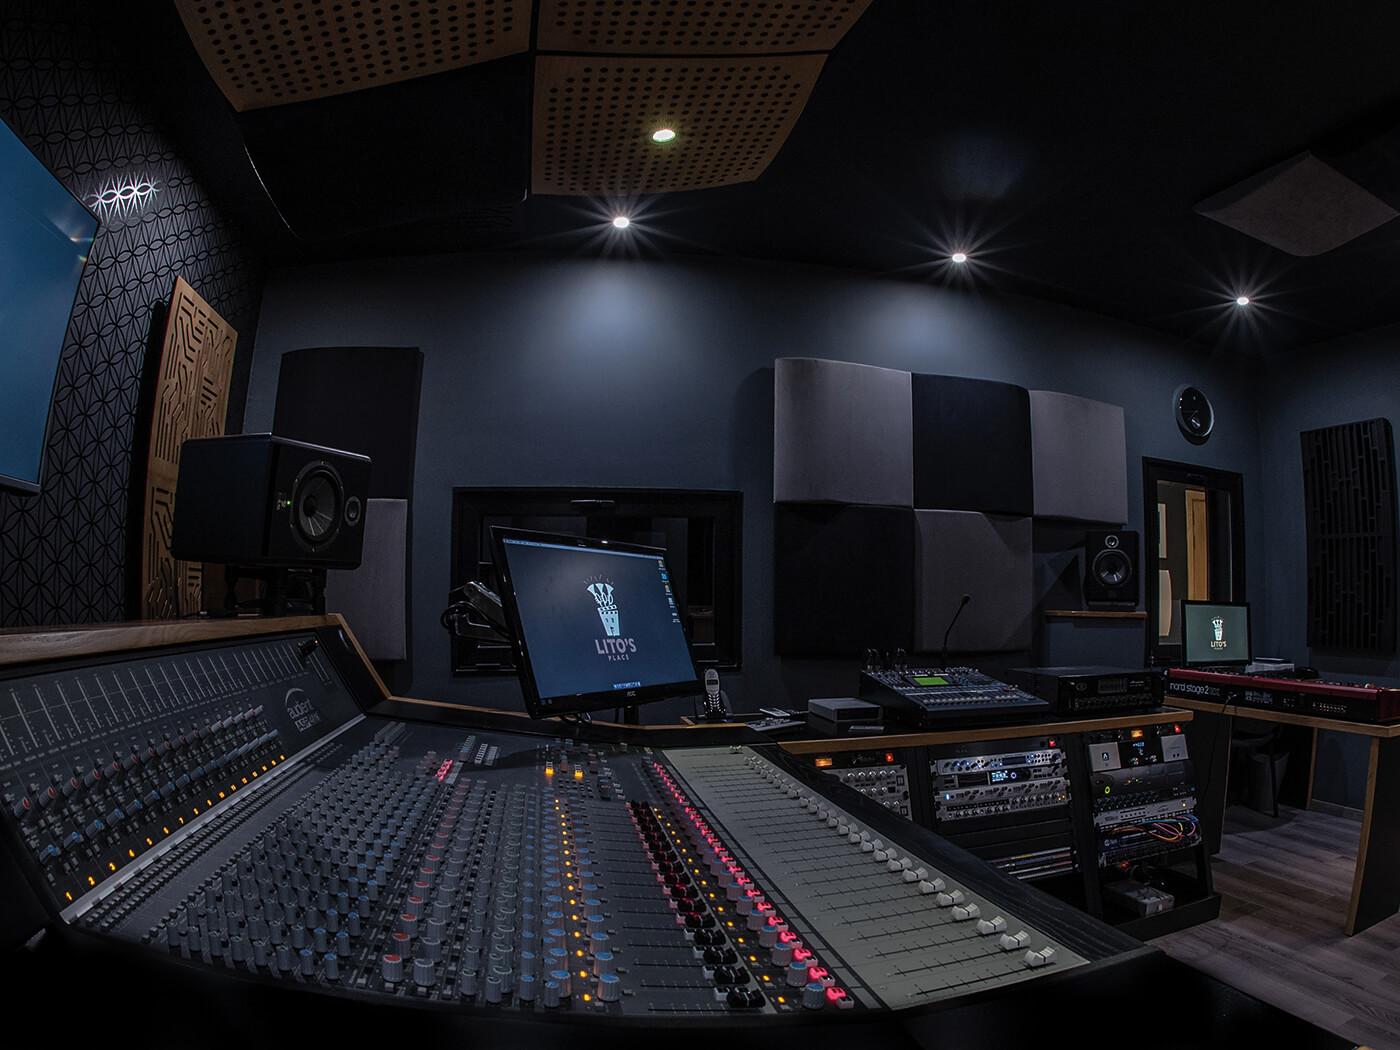 Studio Interviews: Manolito Galea